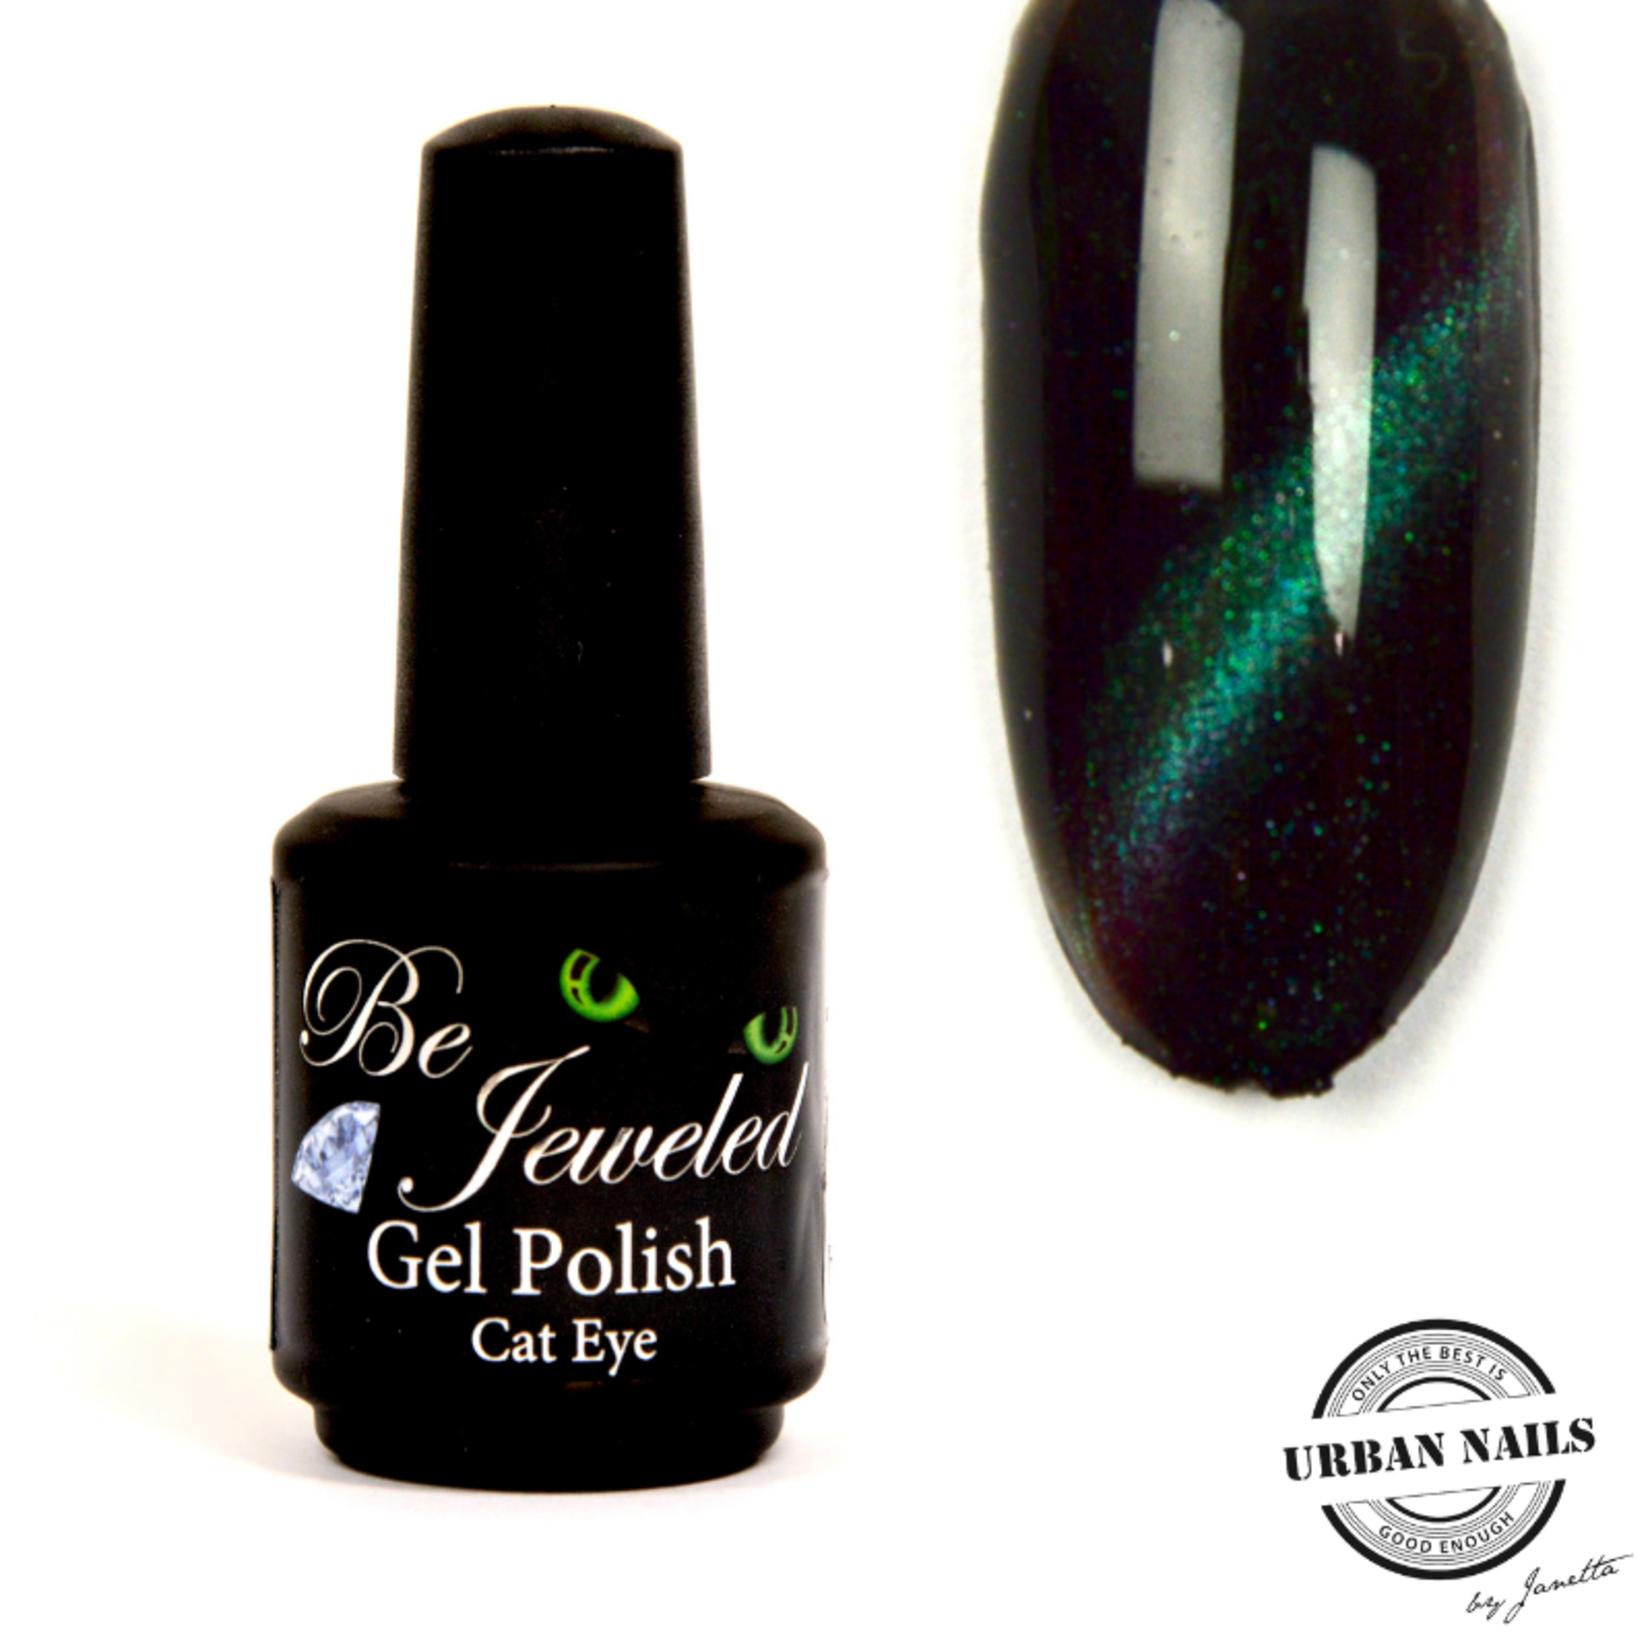 Urban Nails Be Jeweled Cateye 25 (Chameleon) Blauw Groen